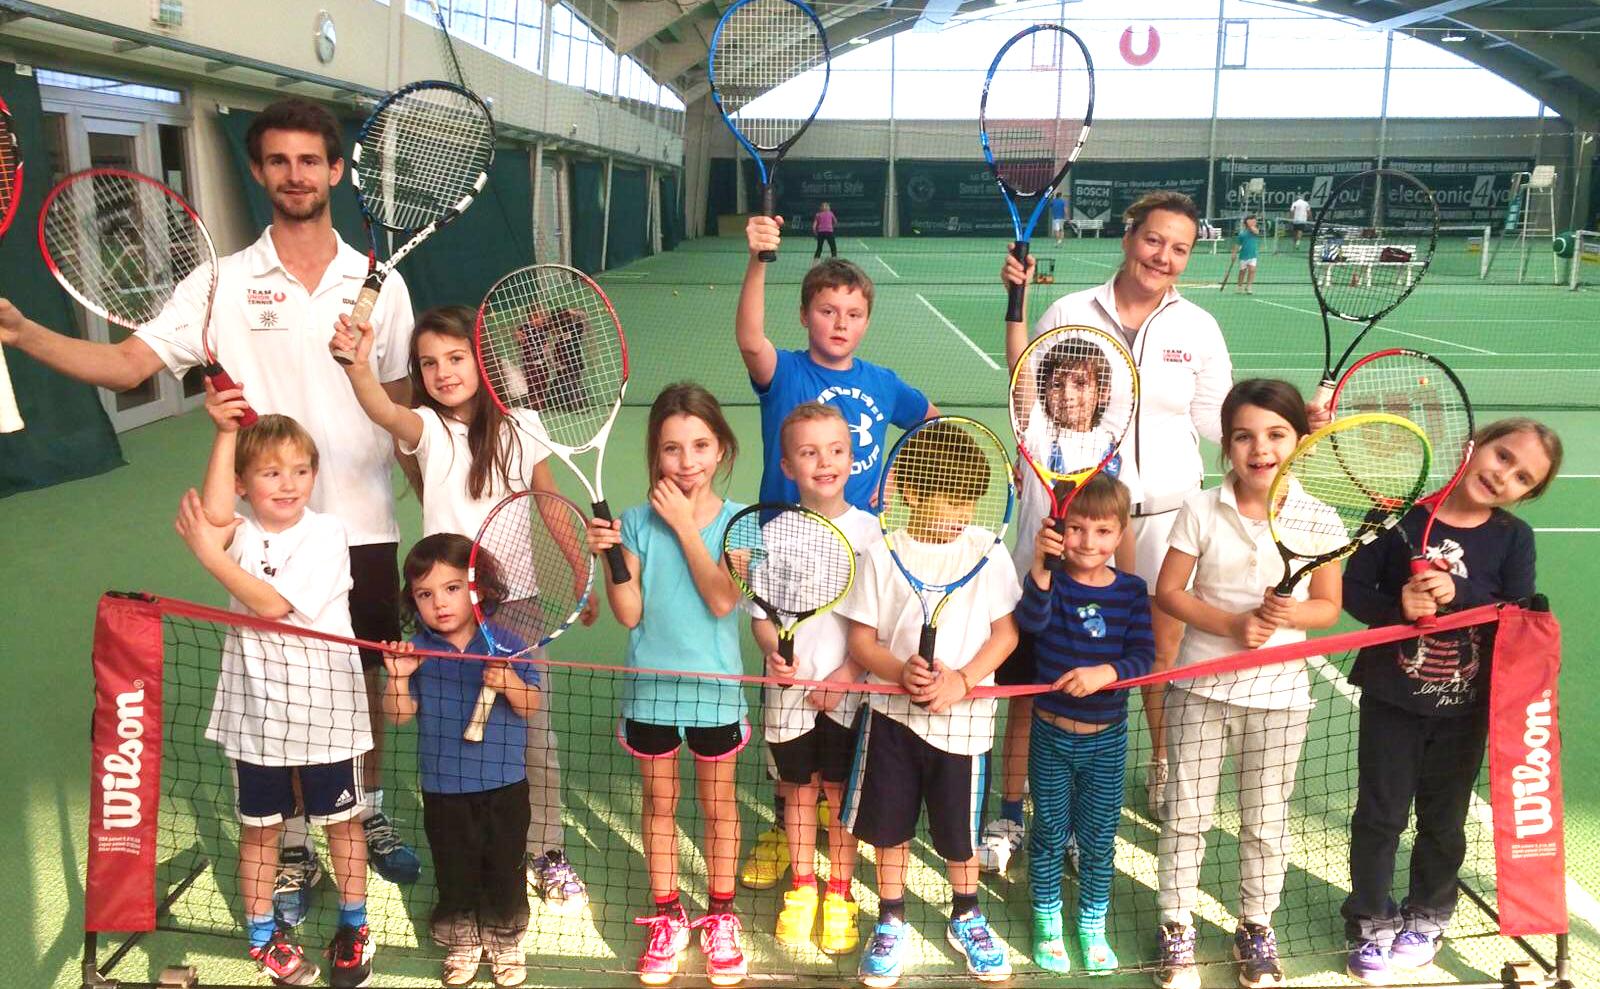 Bambini Training - Sportunion Klagenfurt Tennis